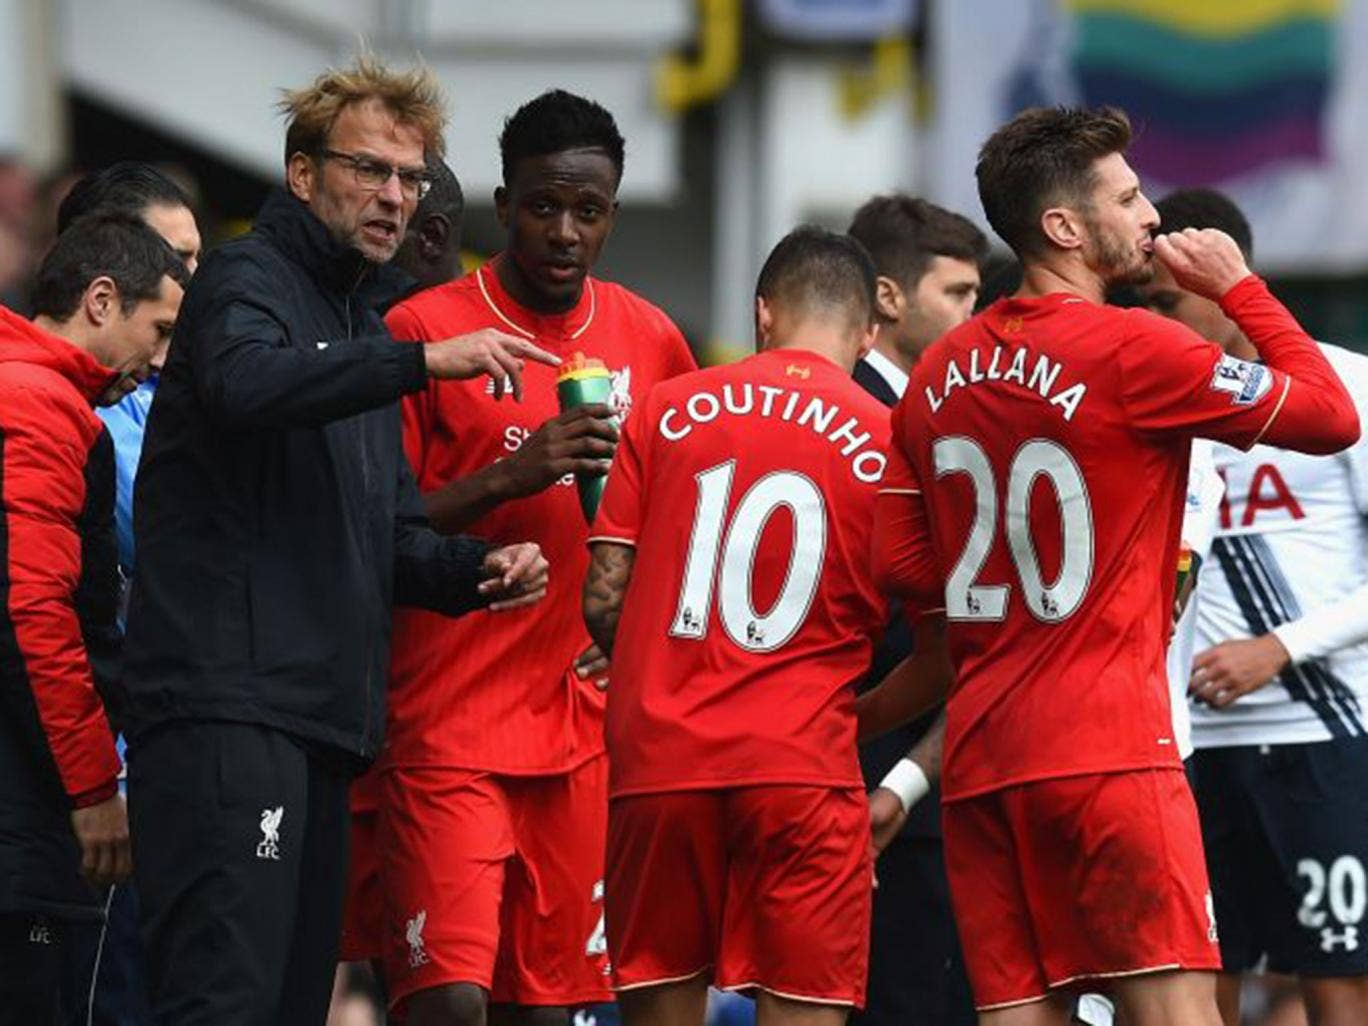 Liverpool ស្វែងរកជ័យជំនះលើកដំបូង ពេលជួបក្រុម Rubin យប់នេះ